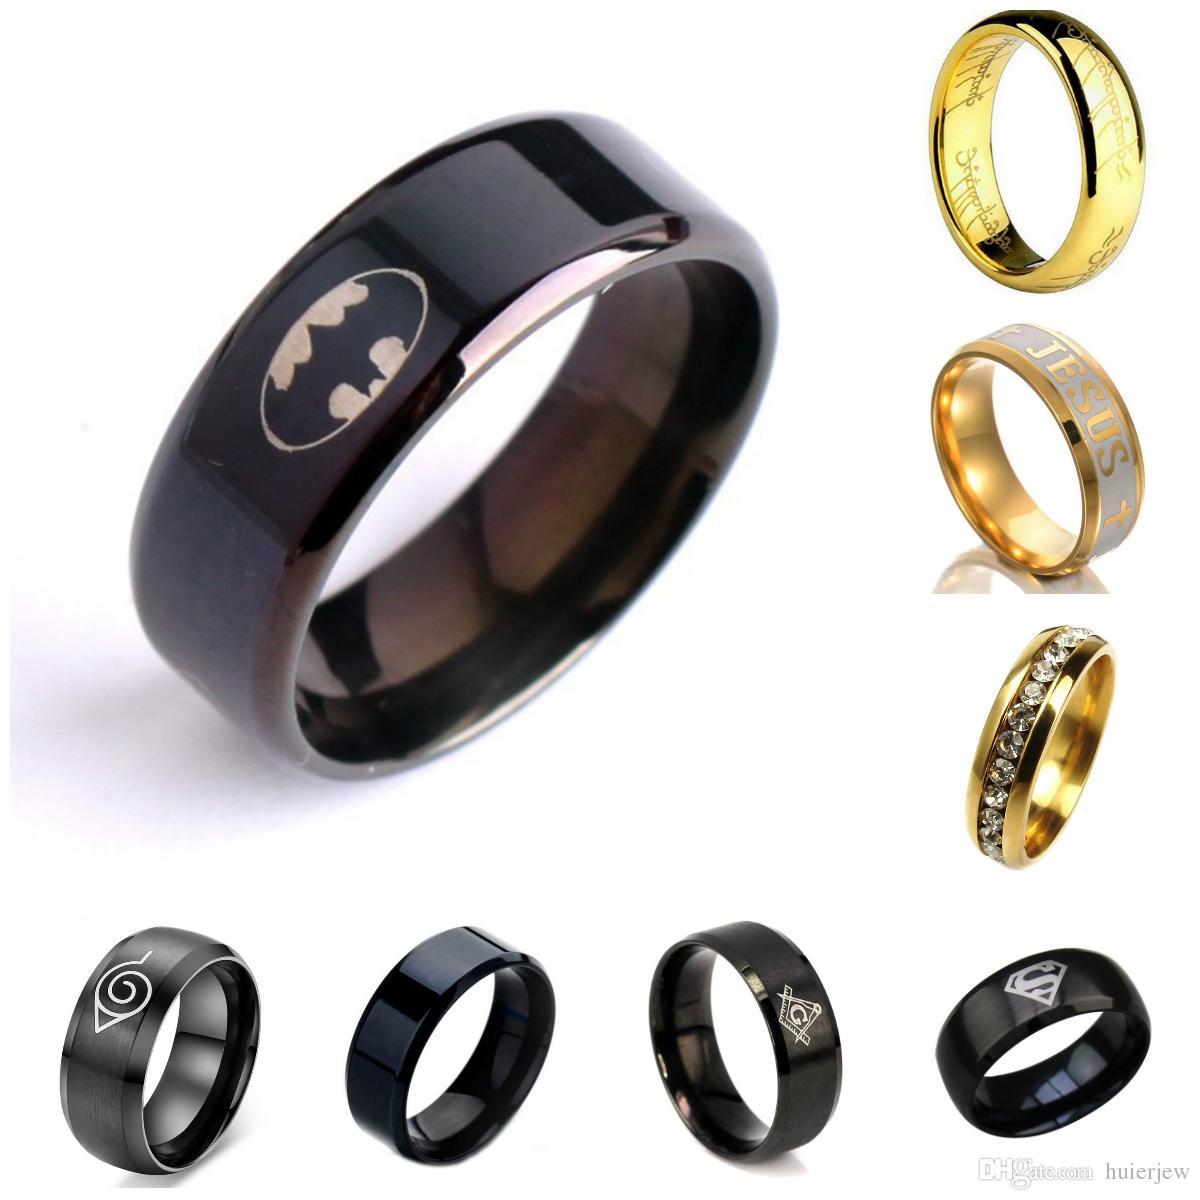 Stainless Steel Rings Cool Black Ring High Polished 316l Titanium Finger Men Boys Fashion Jewelry Size 7 12 For Batman Mens Gold Engagement: Black Rings Wedding Rings At Reisefeber.org